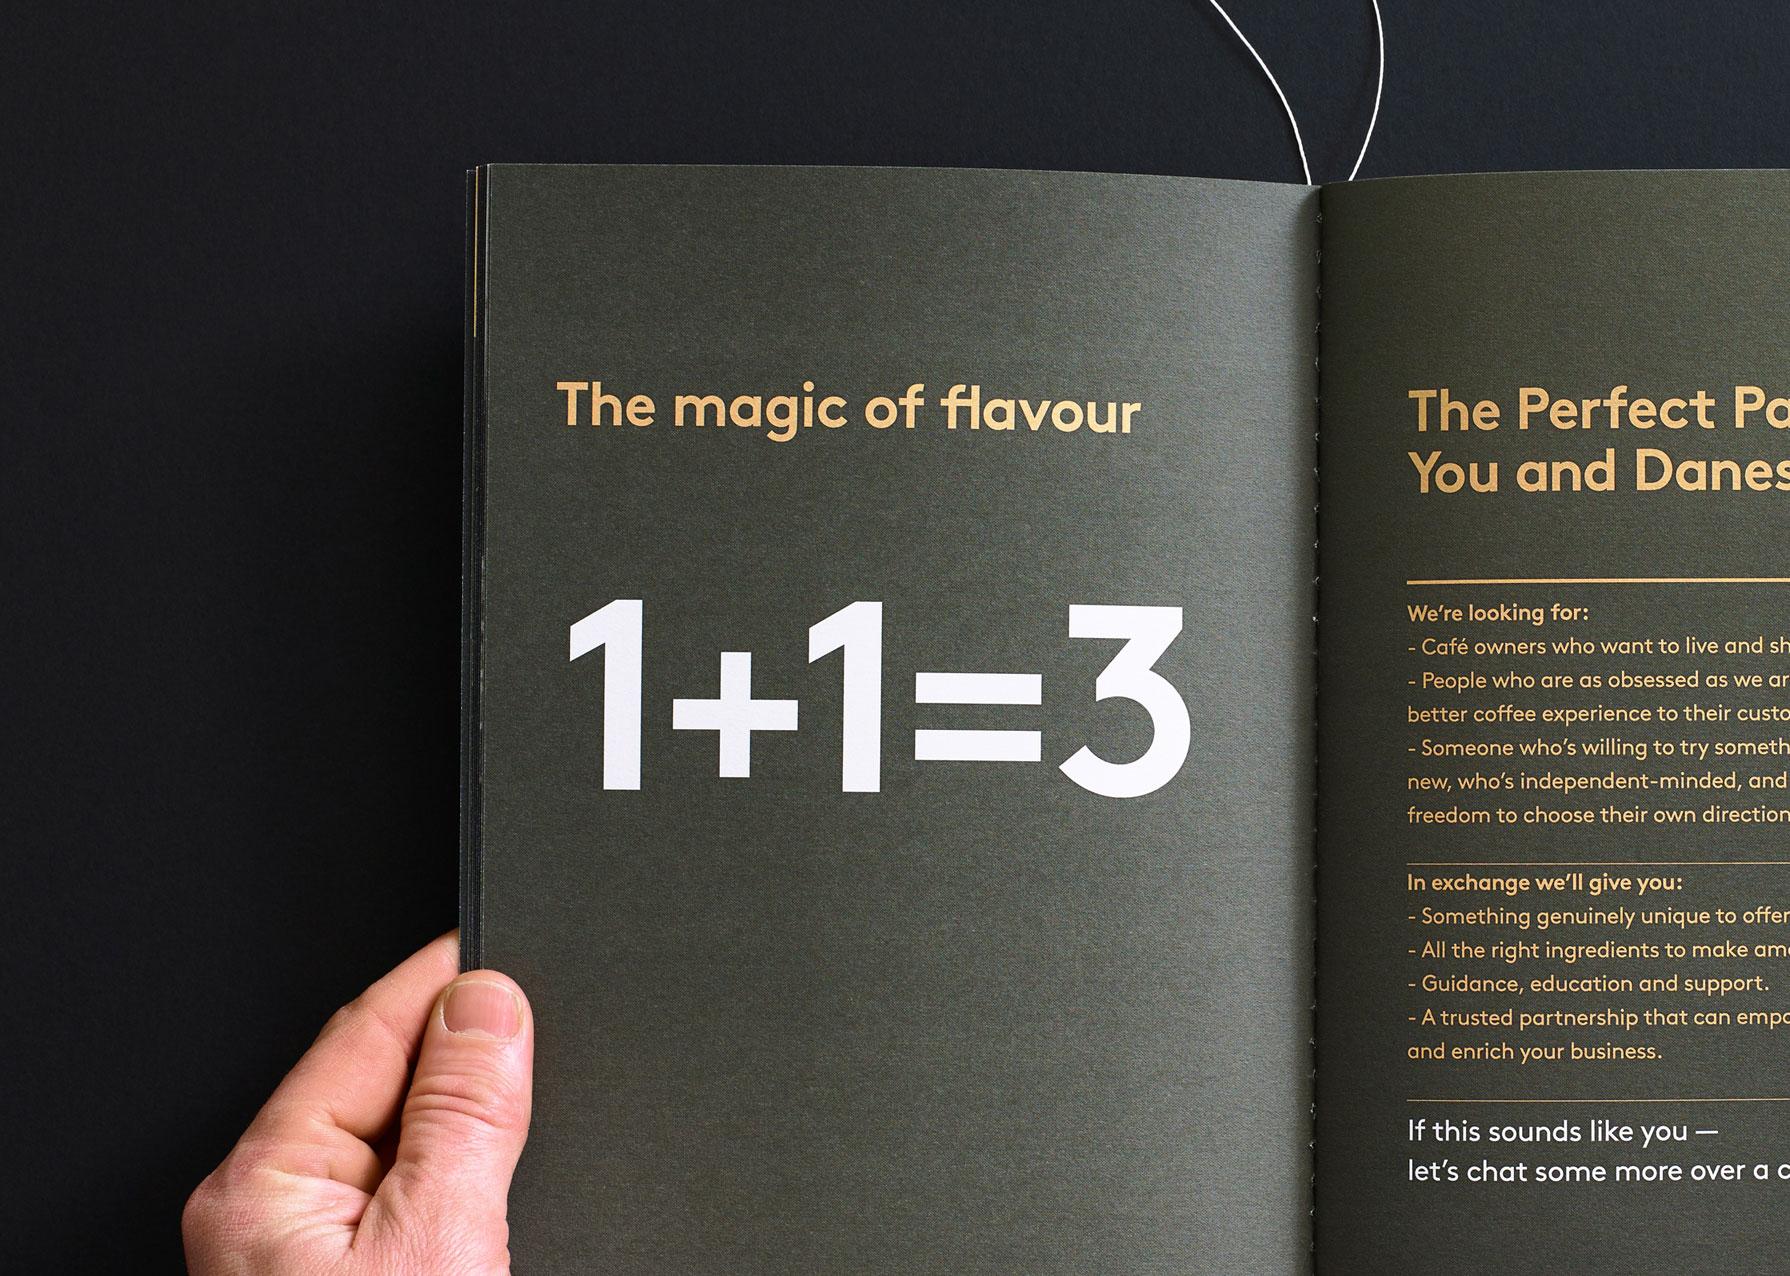 The Magic of Flavour spread